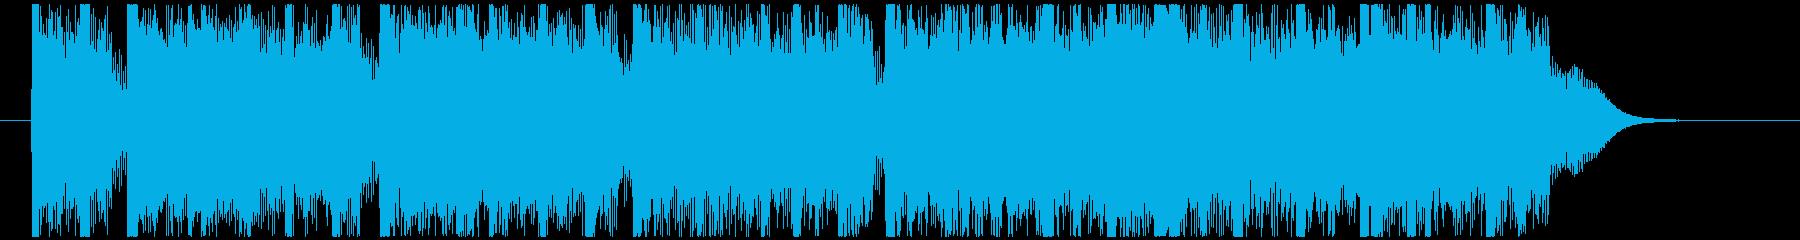 テーレッテーテーレッテーテーレッテーテーの再生済みの波形